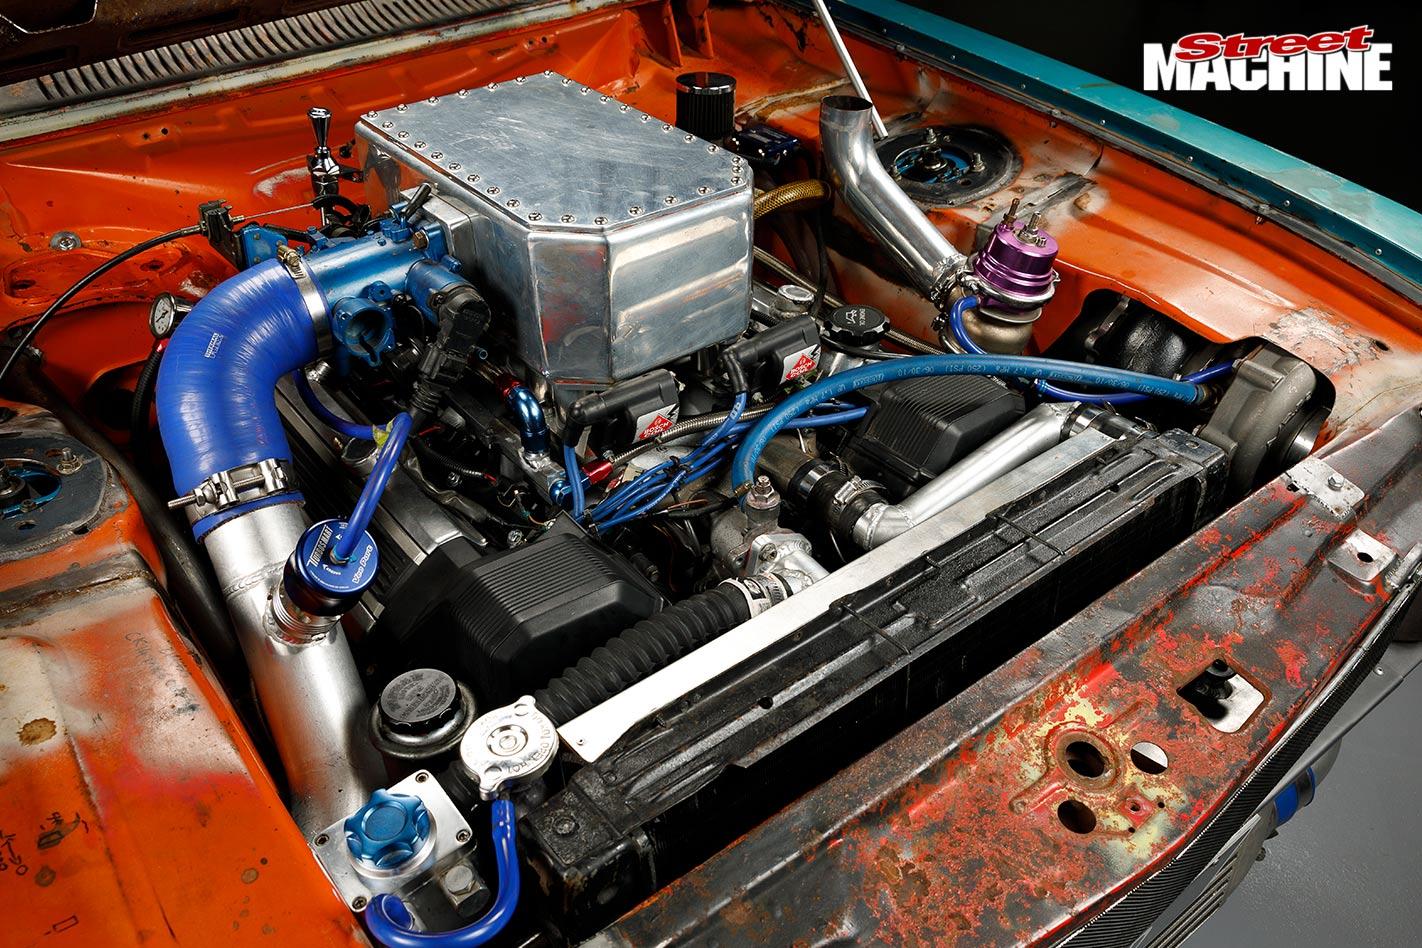 Ford Capri engine bay